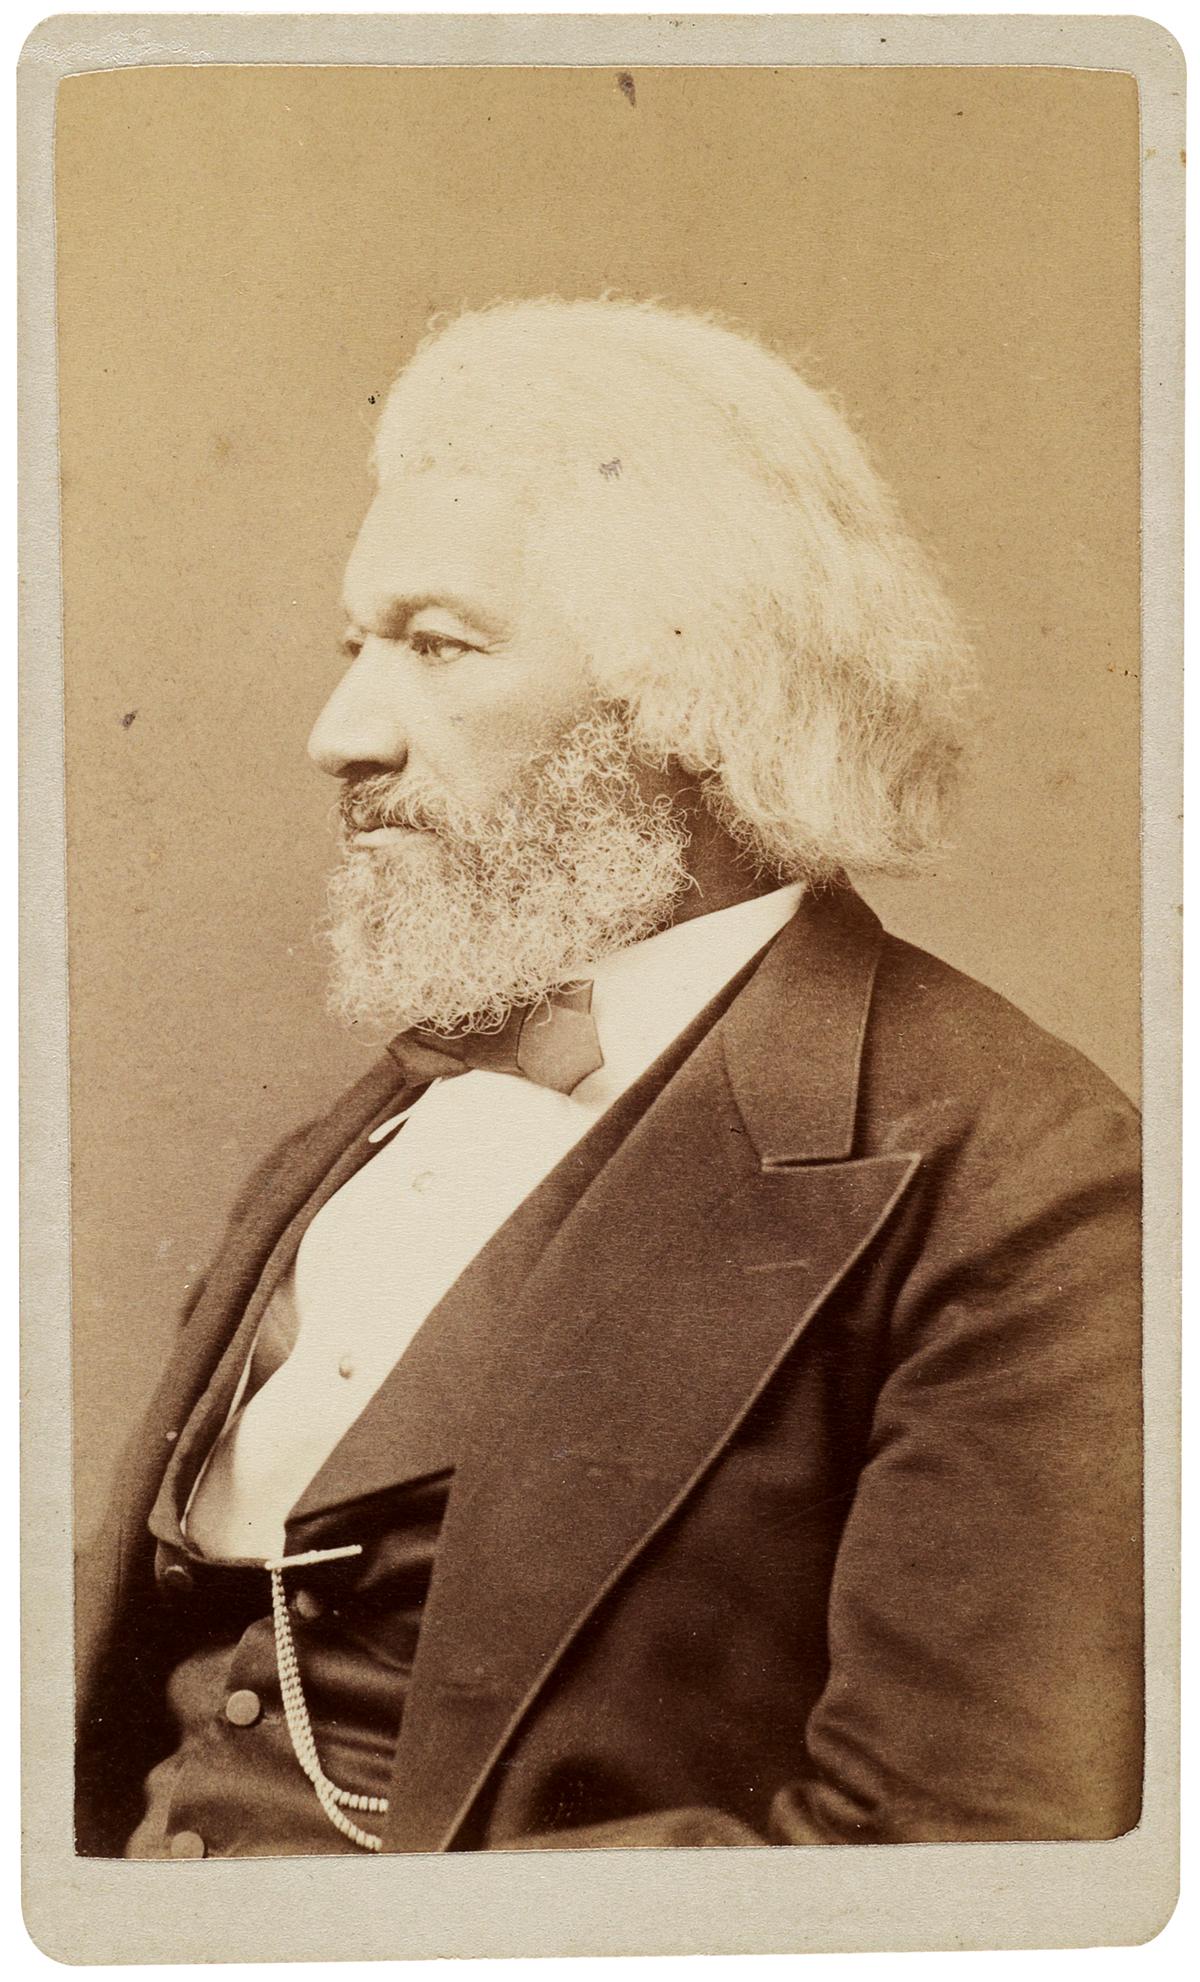 (DOUGLASS, FREDERICK.) Fassett, Samuel M.; photographer. Previously unknown carte-de-visite portrait of Douglass.